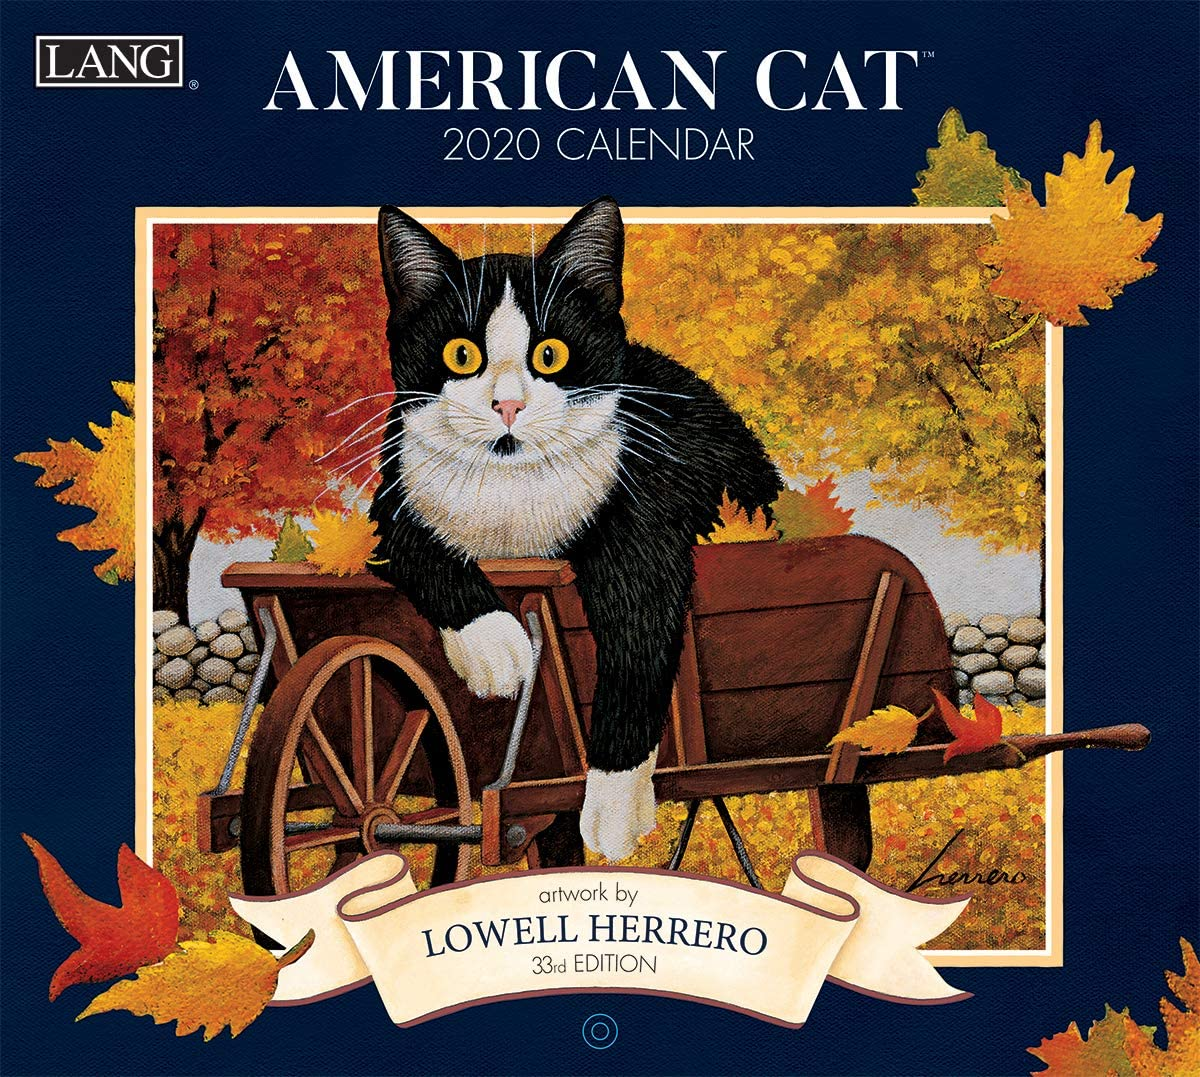 Lang American Cat 2020 Wall Calendar (20991001889)